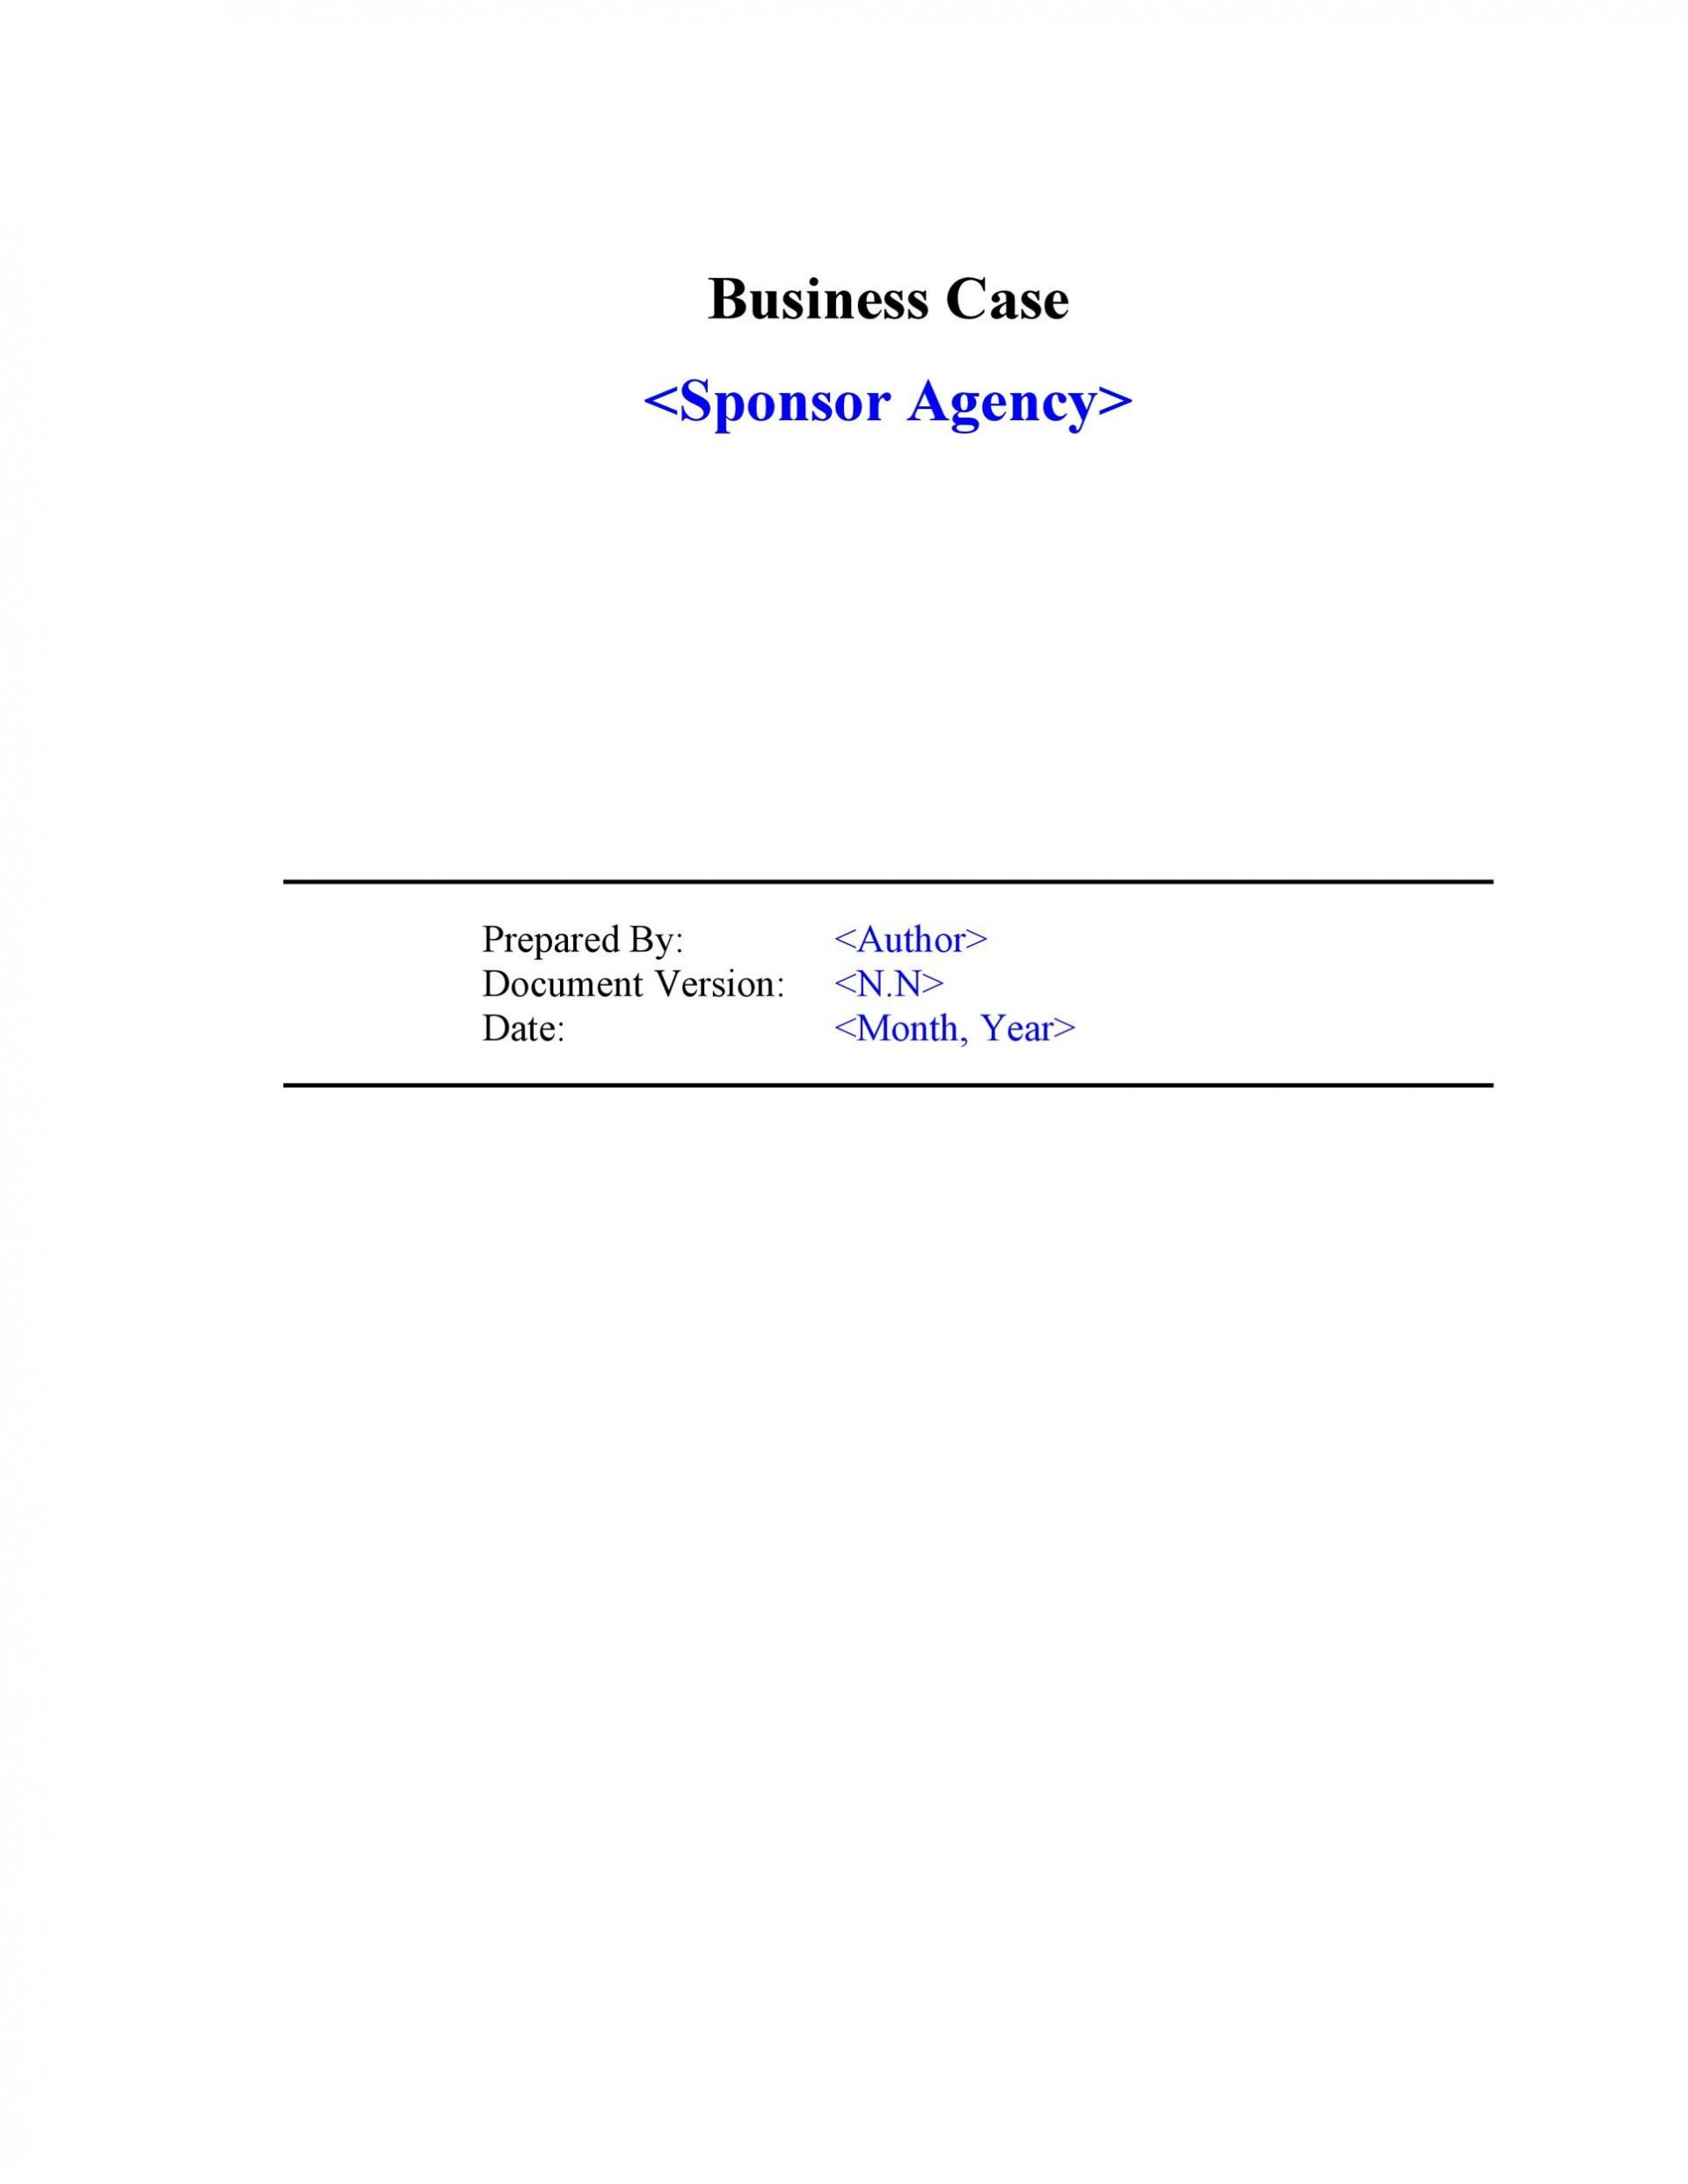 005 Impressive Simple Busines Case Template Image  Ppt Proposal Example Pdf1920